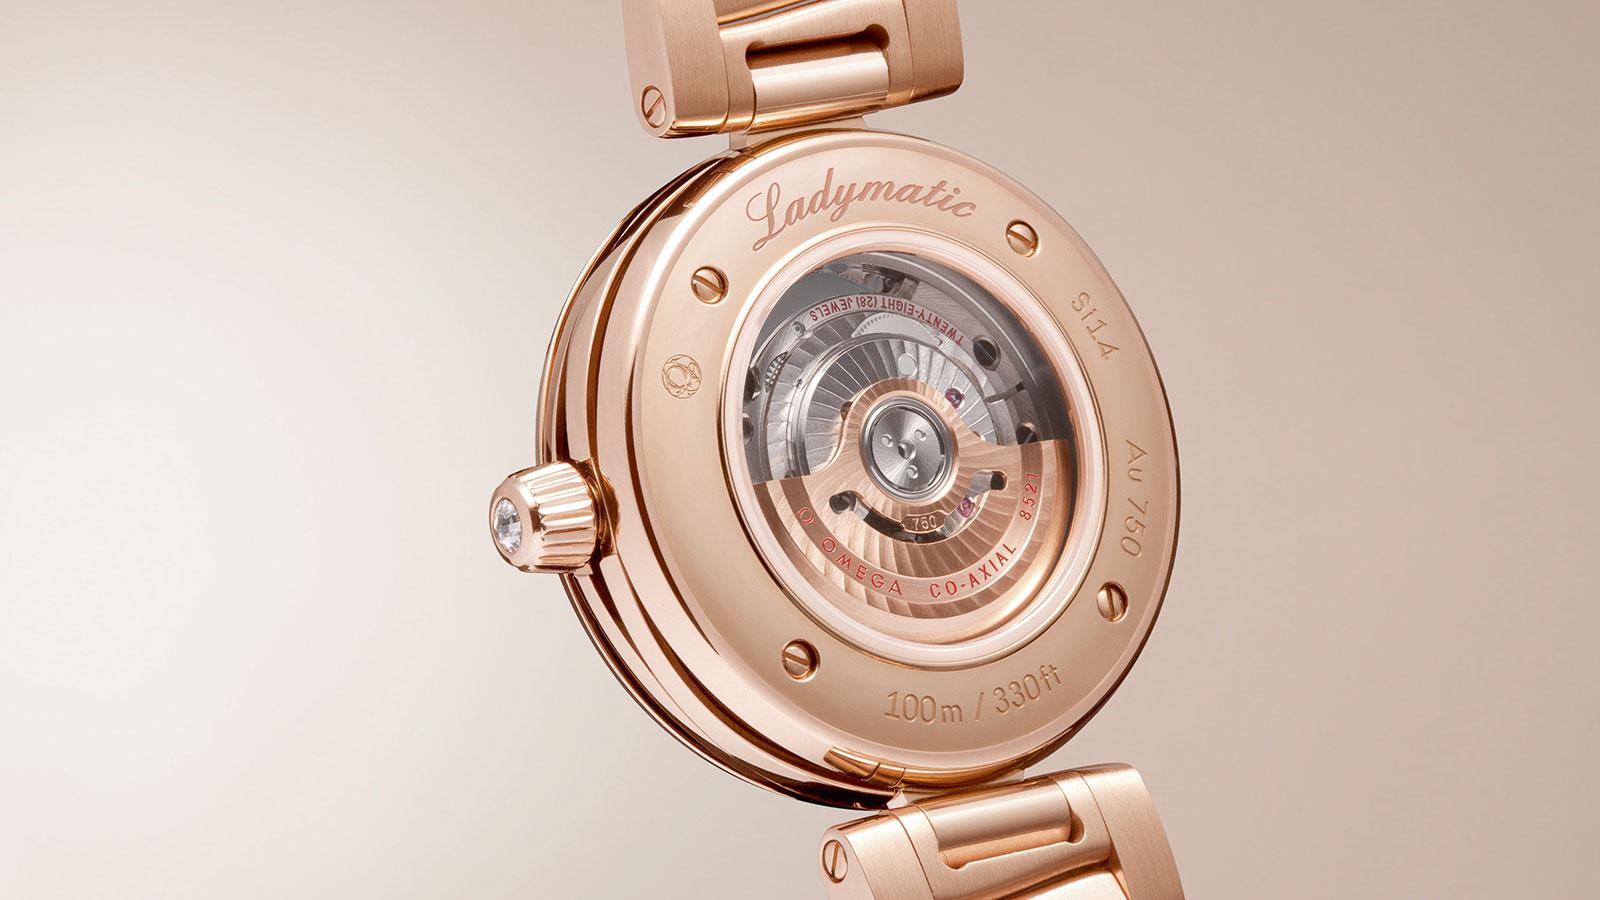 碟飞系列 LADYMATIC腕表 Ladymatic腕表 欧米茄34毫米同轴腕表 腕表 - 425.65.34.20.51.001